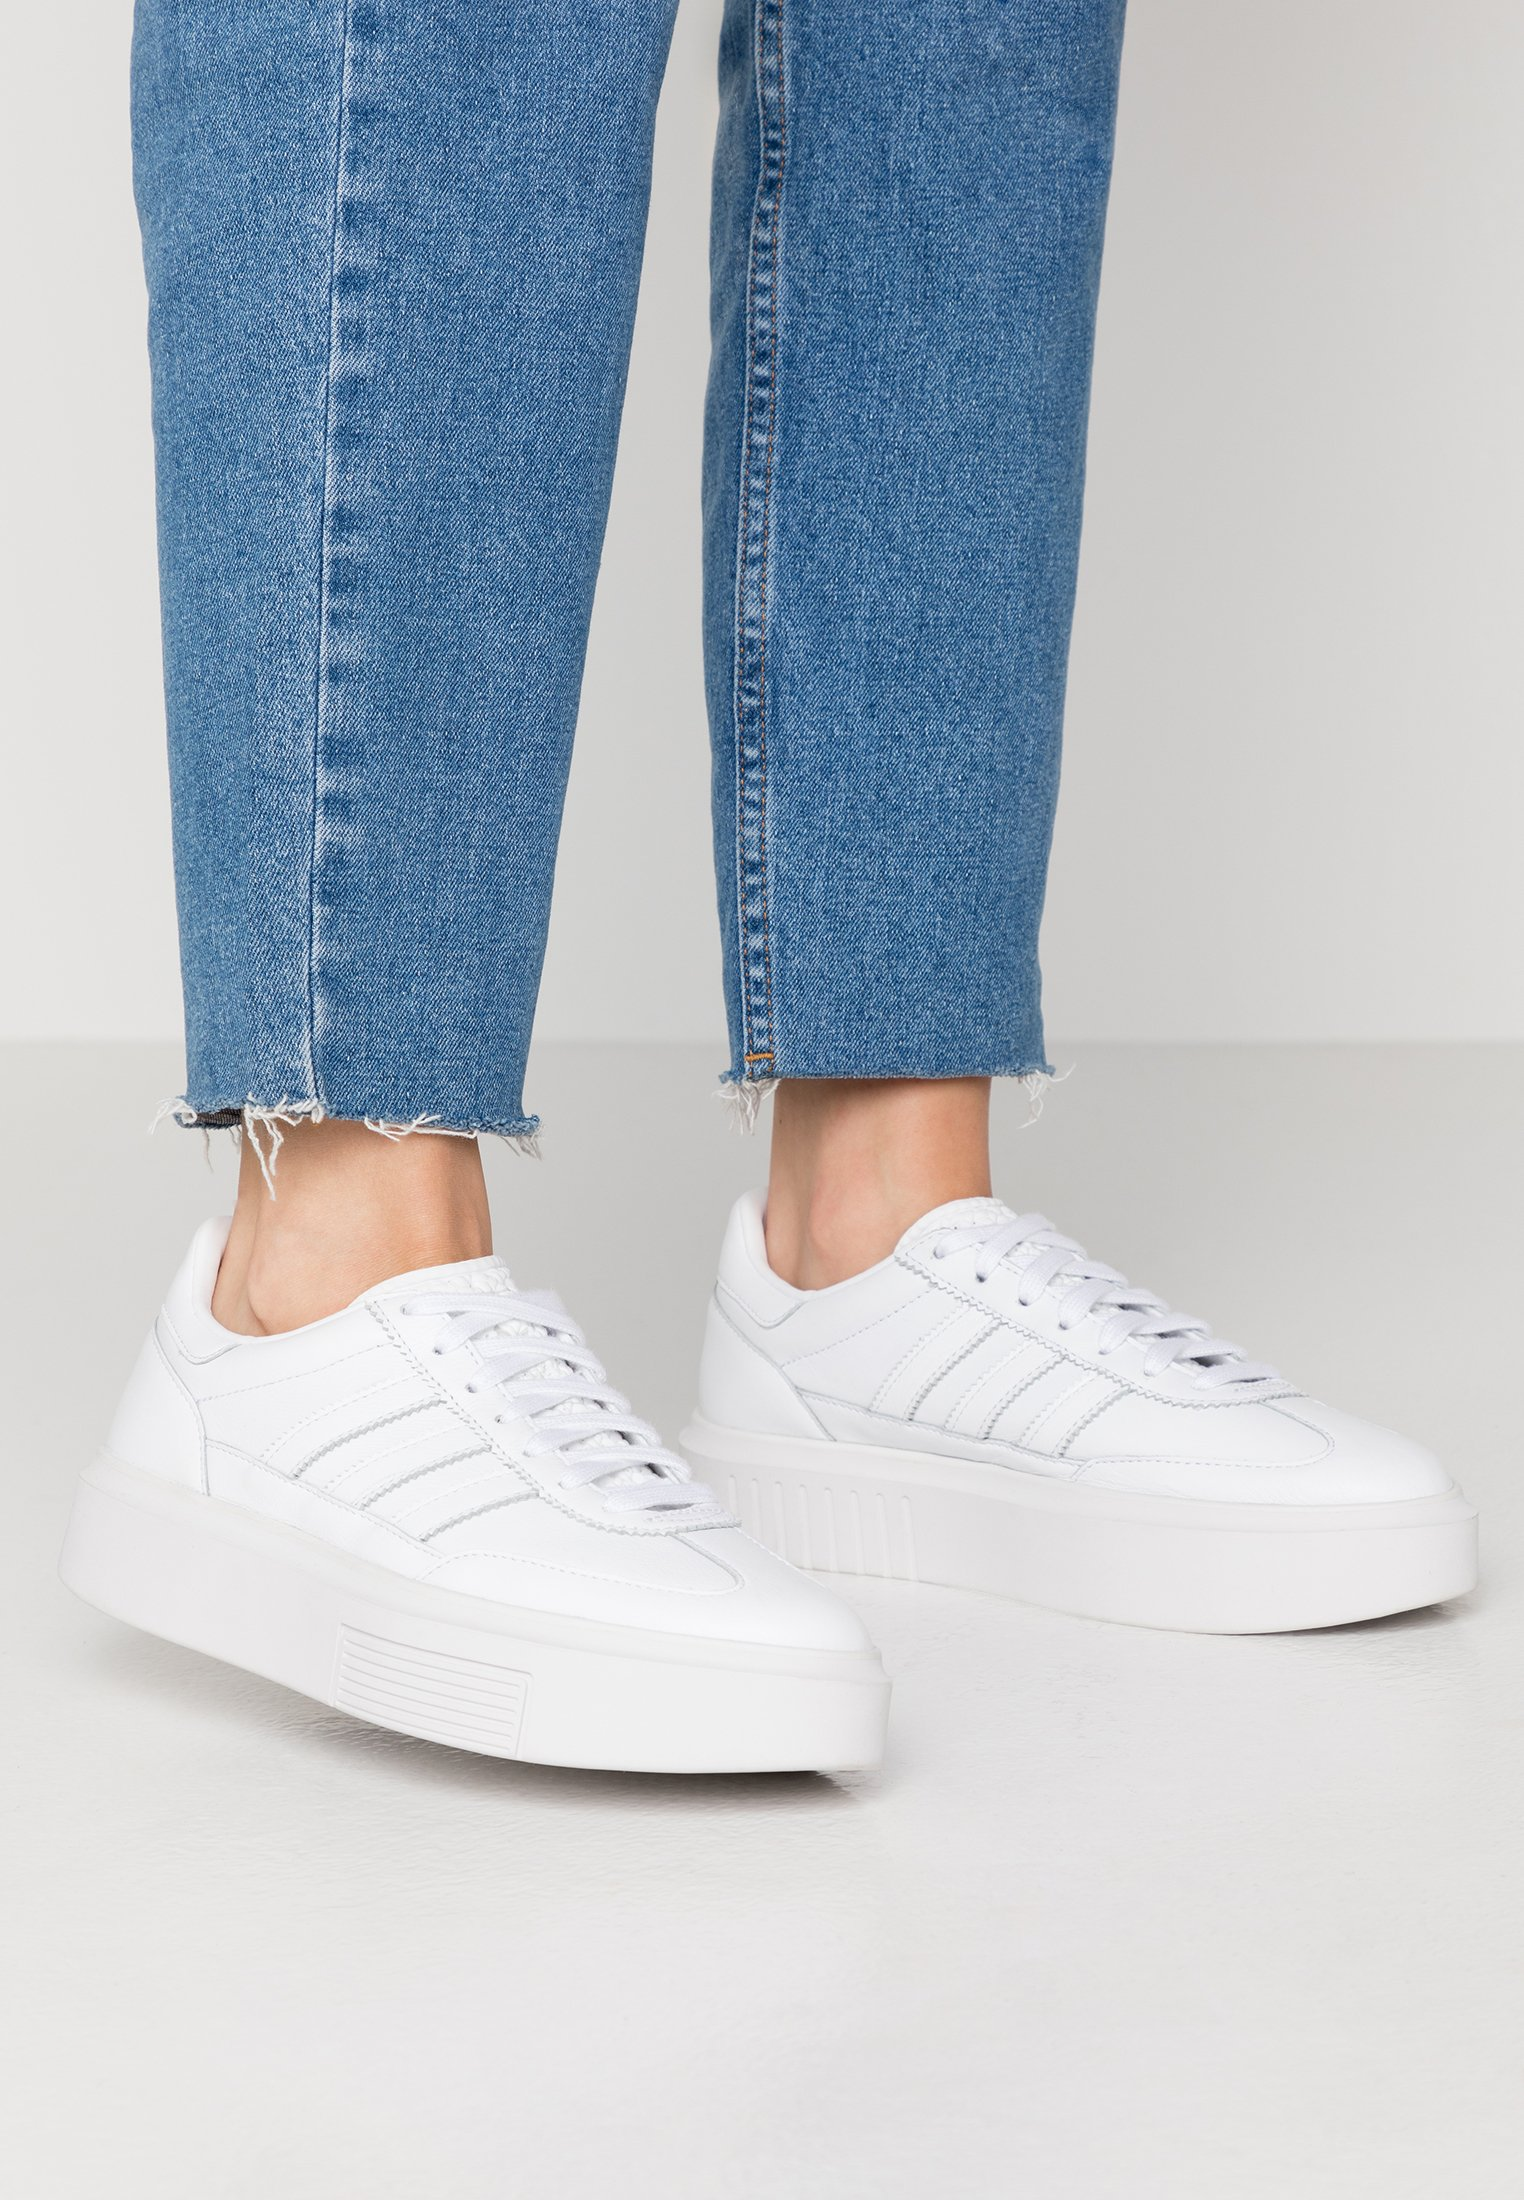 Muerto en el mundo candidato Oriental  adidas Originals SLEEK SUPER 72 - Trainers - footwear white/crystal white -  Zalando.co.uk